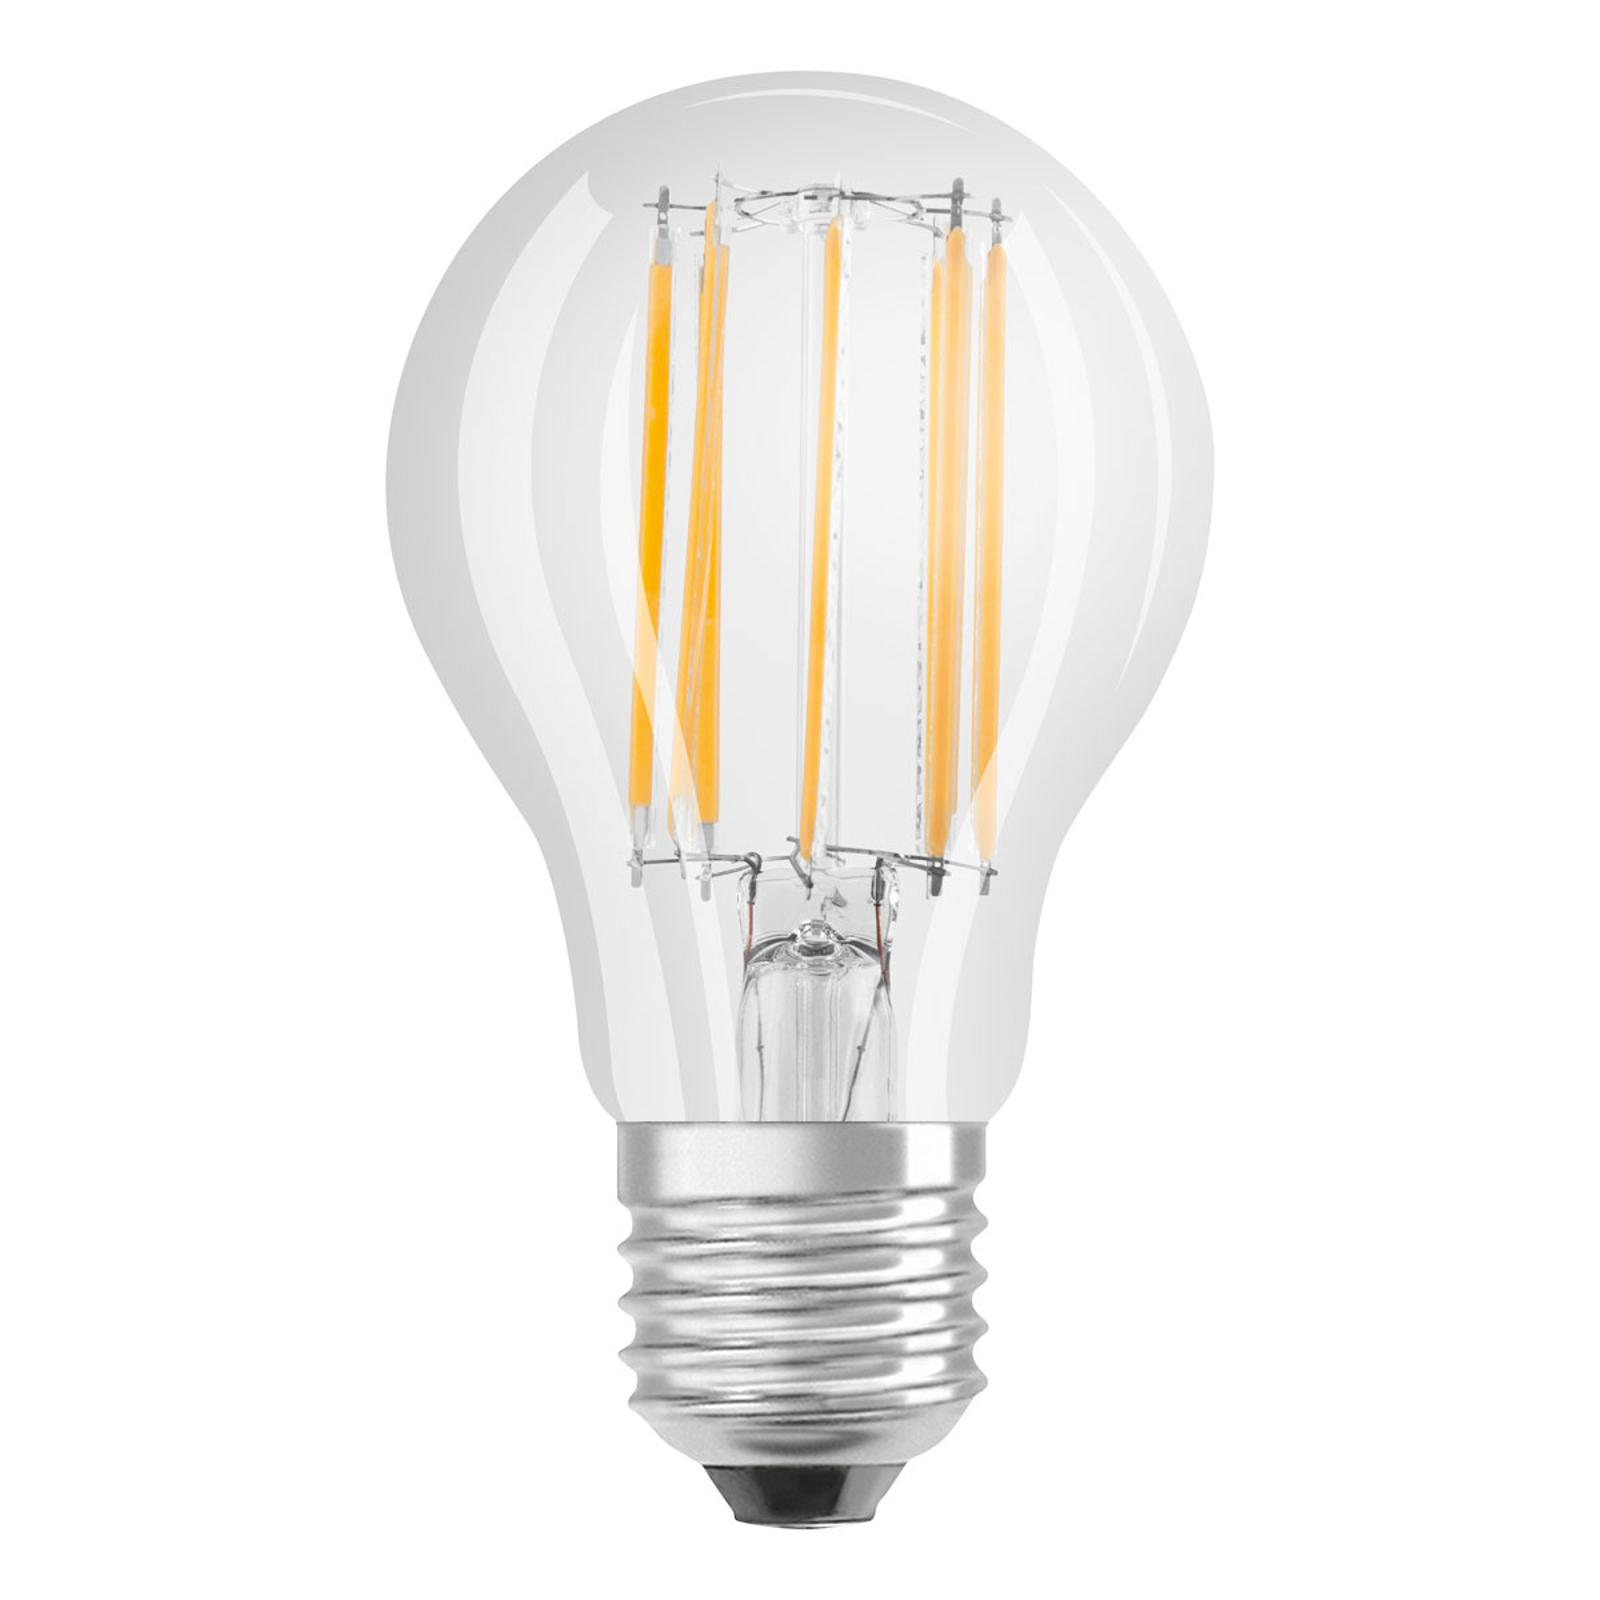 OSRAM-LED-lamppu E27 10W Filament 4 000 K kirkas